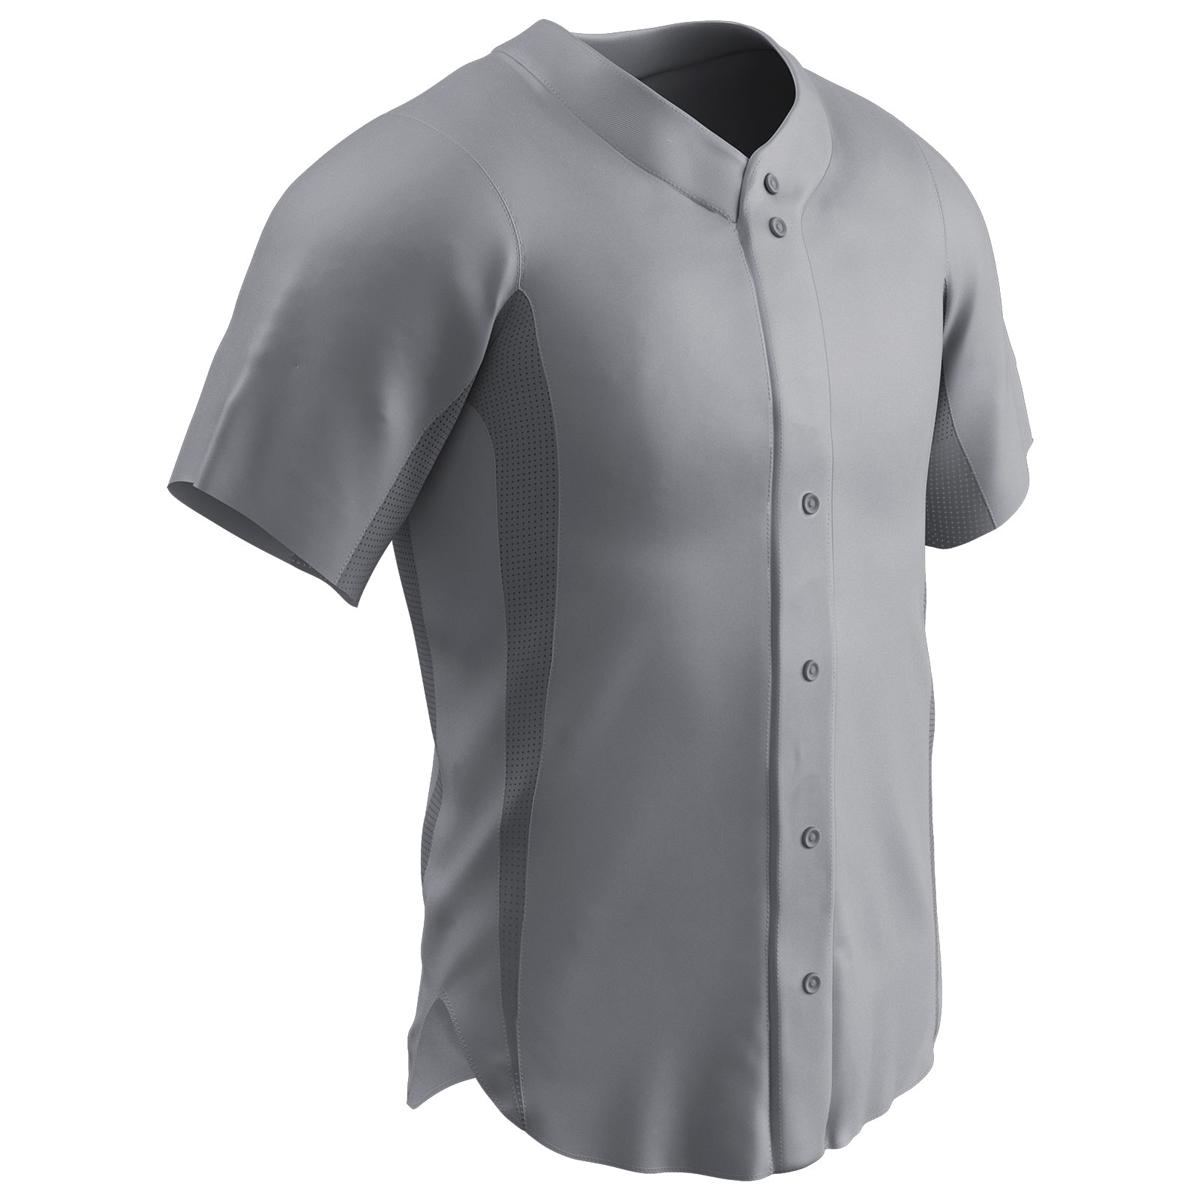 CHAMPRO Wild Card 2 Button Polyester Baseball//Softball Jersey White,Grey Adult Small